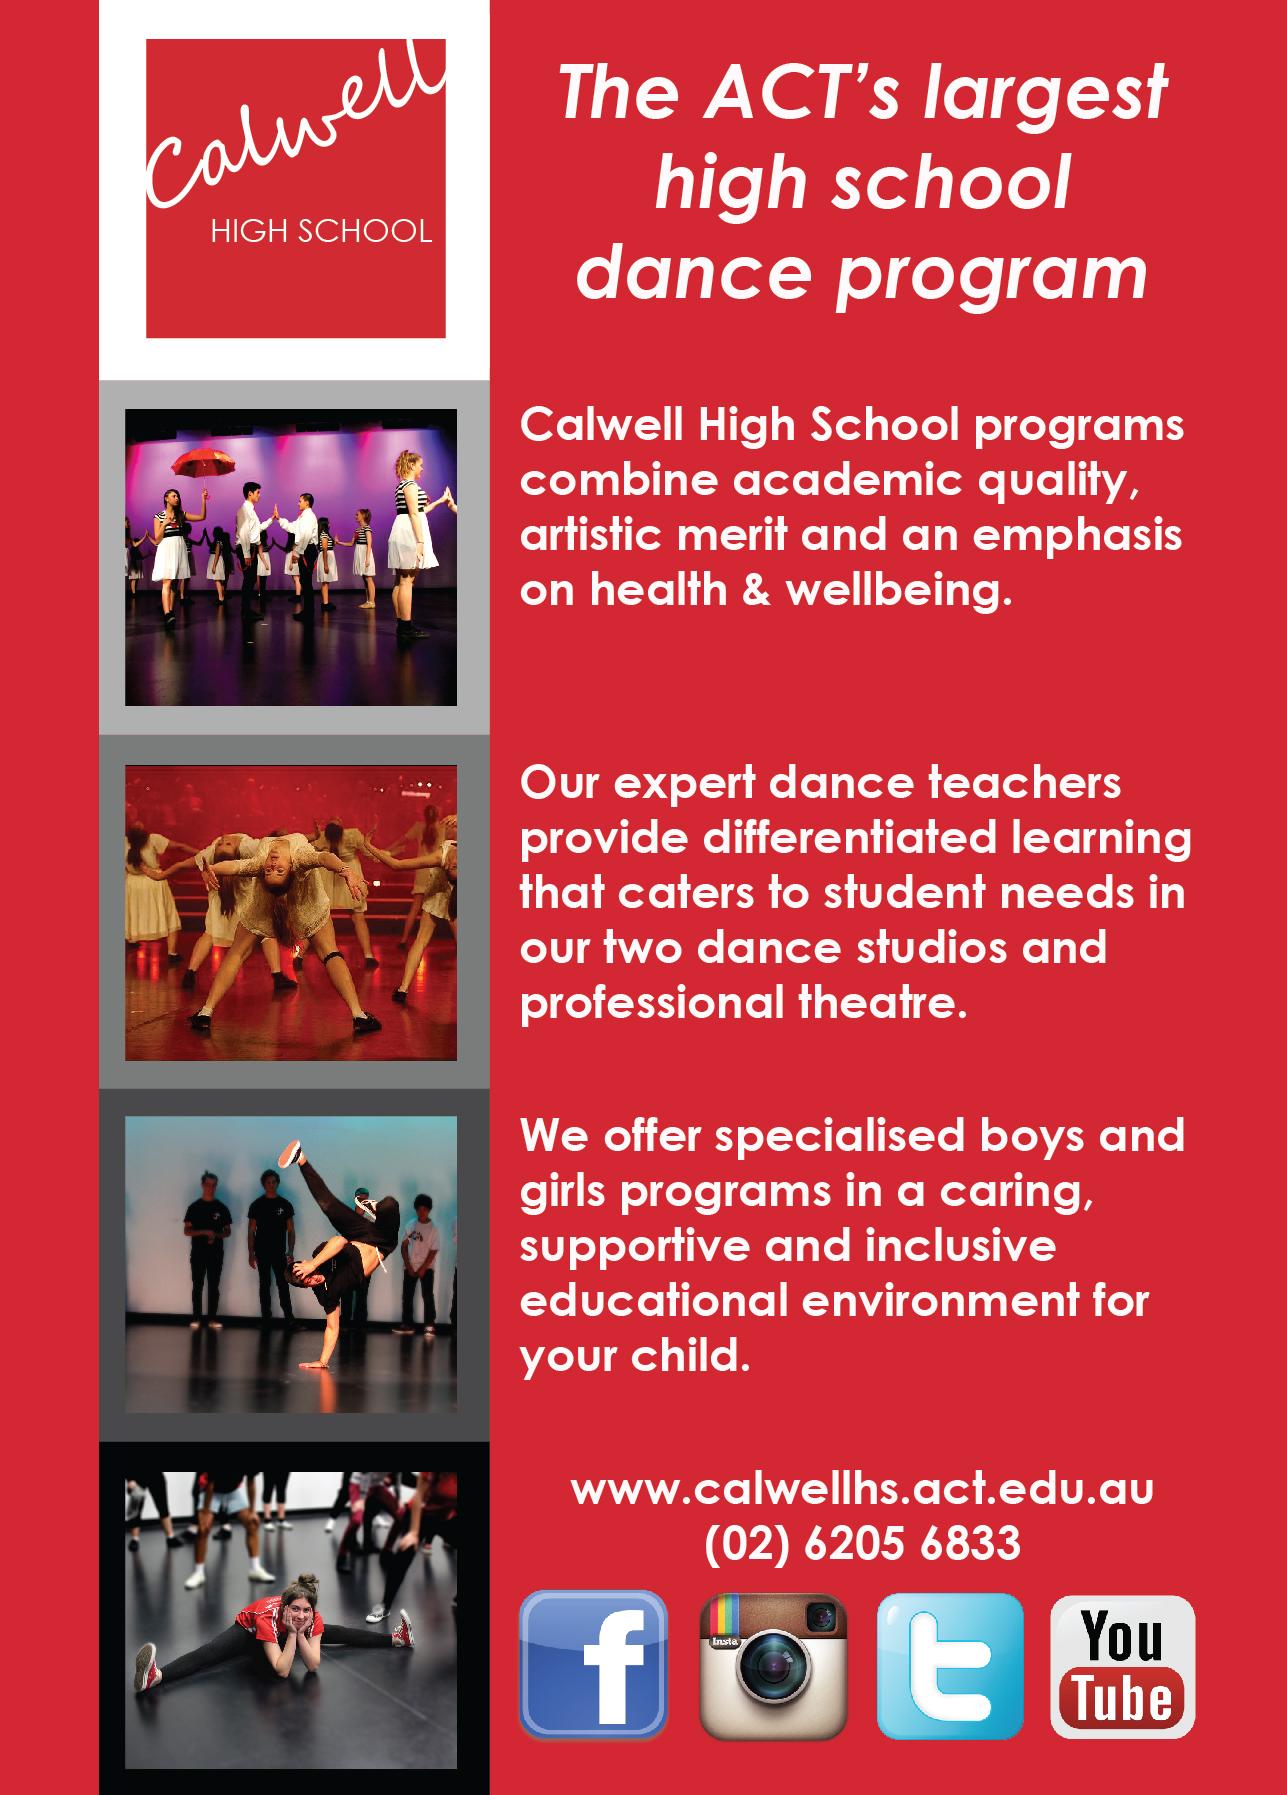 Calwell Dance Program Images